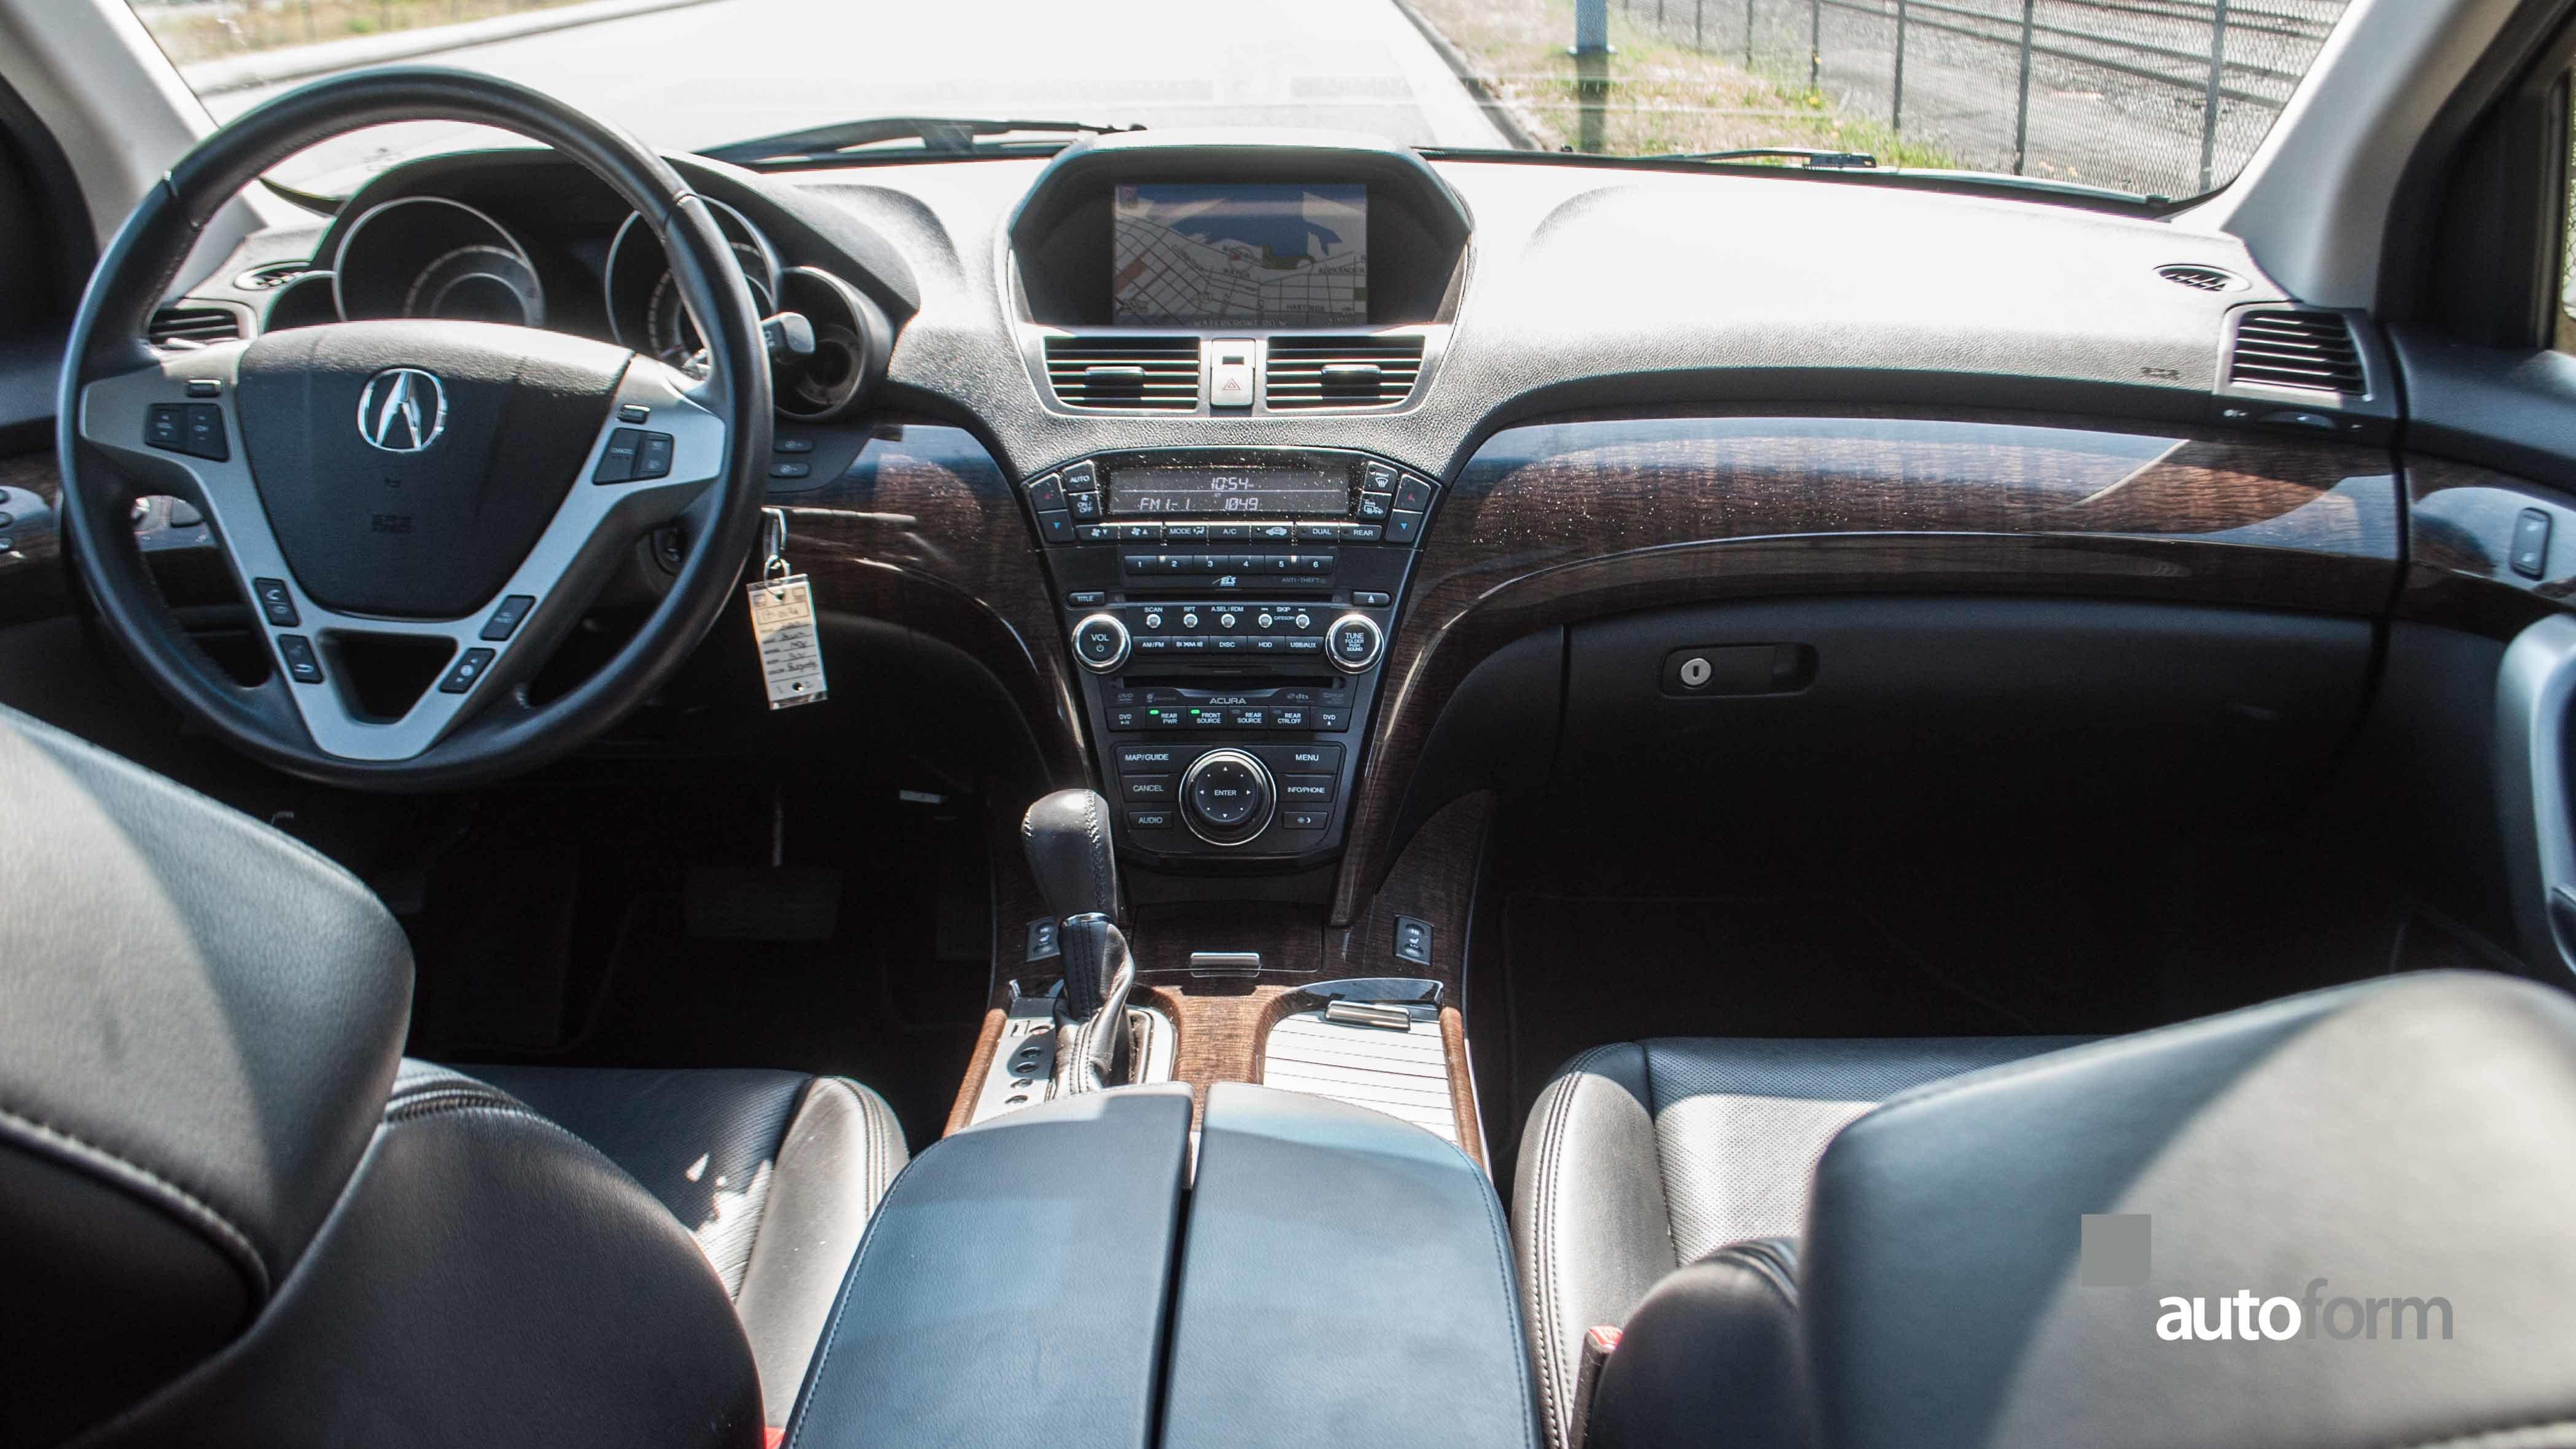 dealership brand mdx dealer es car inventory demo new austin acura